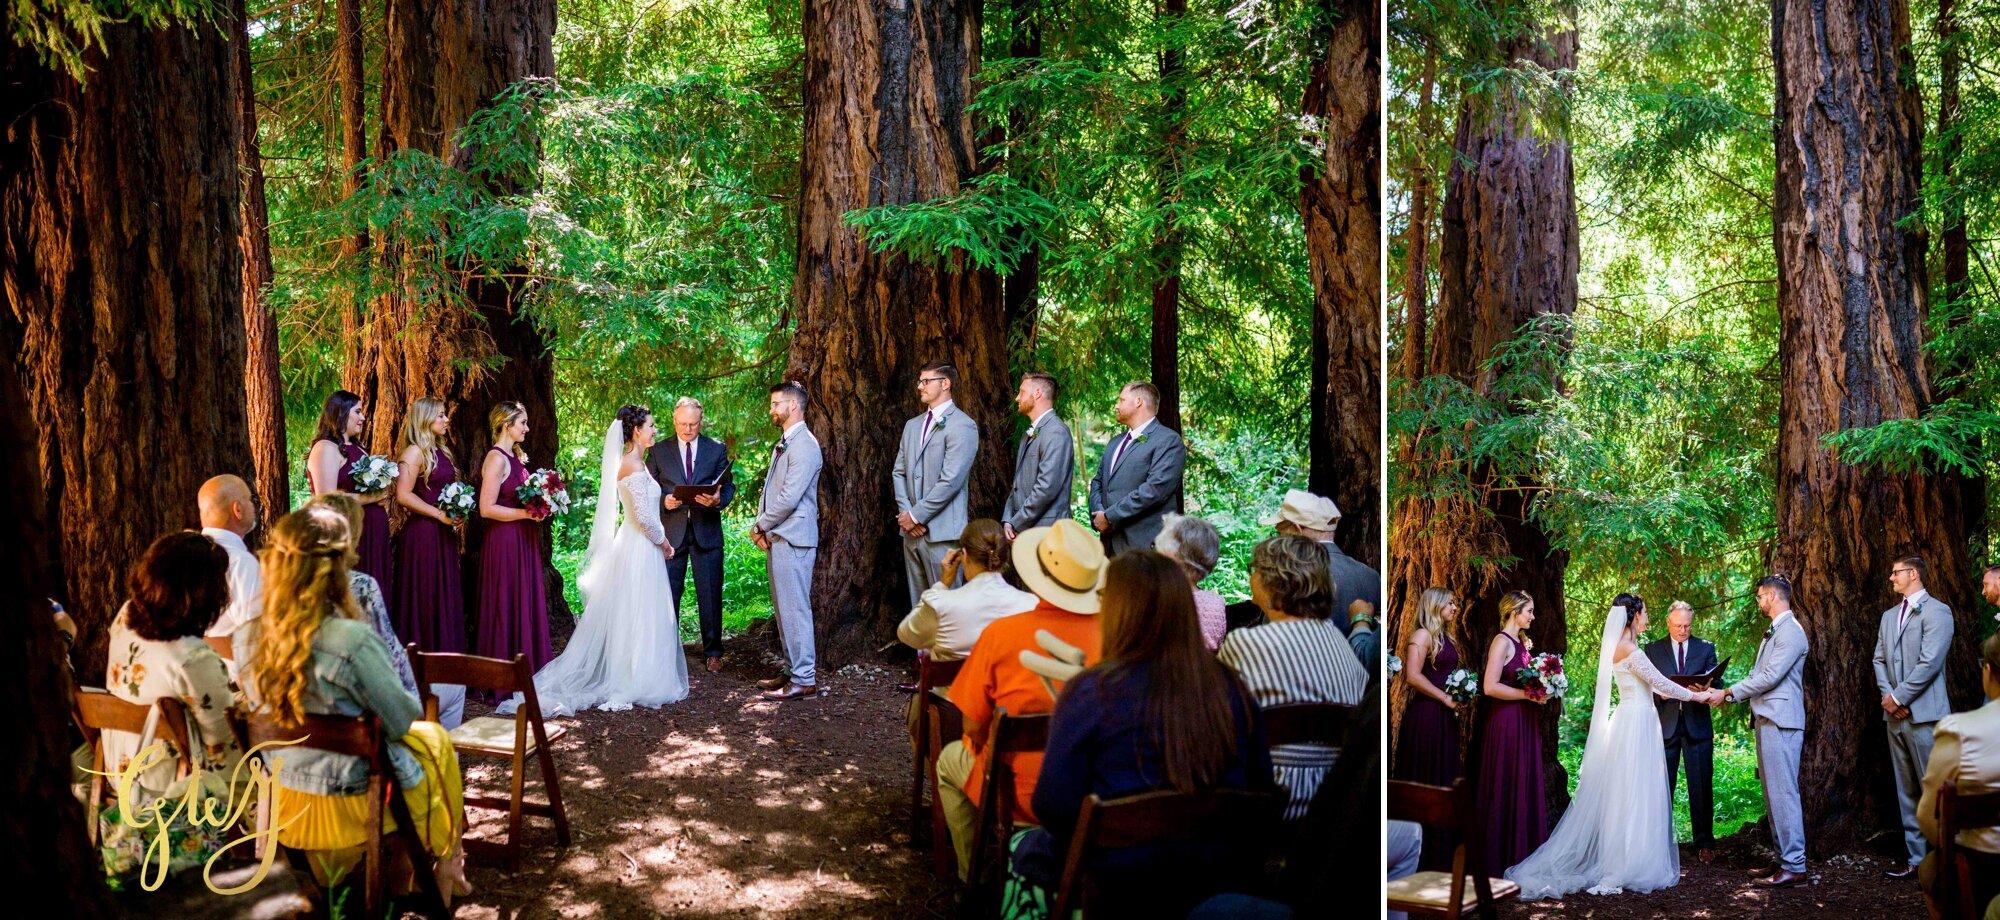 Casey + Jordan's Intimate Big Sur Elopement in the Redwoods by Glass Woods Media 33.jpg